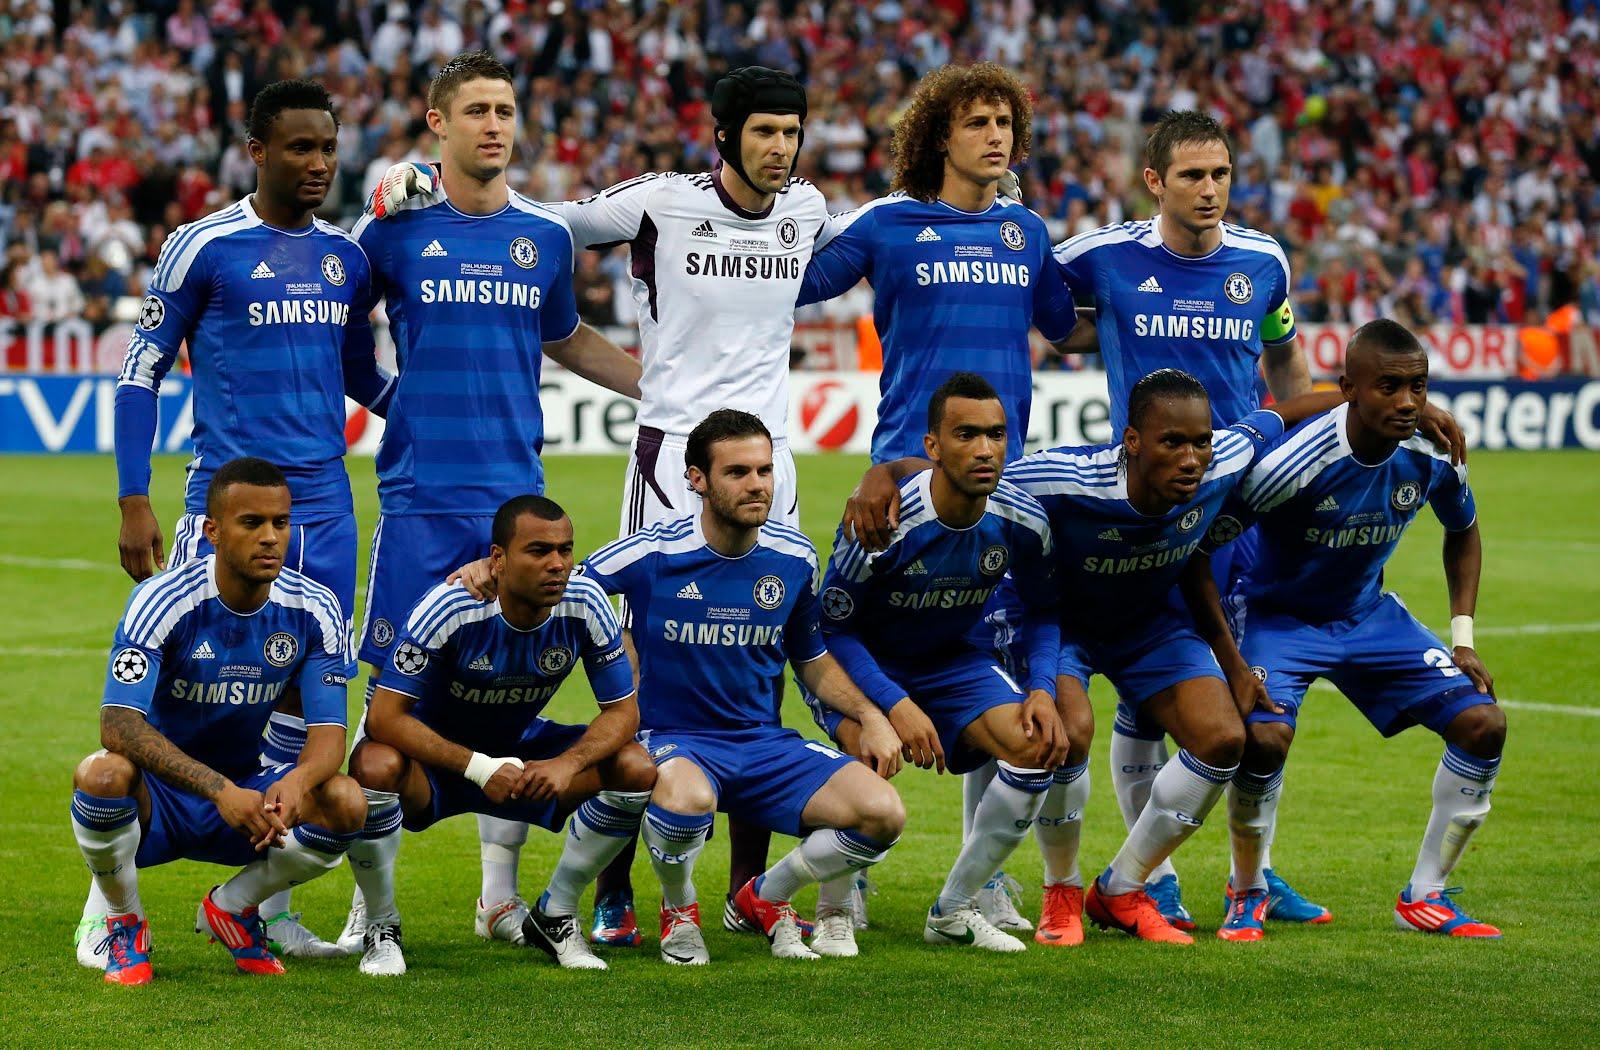 Kora2014 كورة: Chelsea are Europe Champions after Dramatic ...